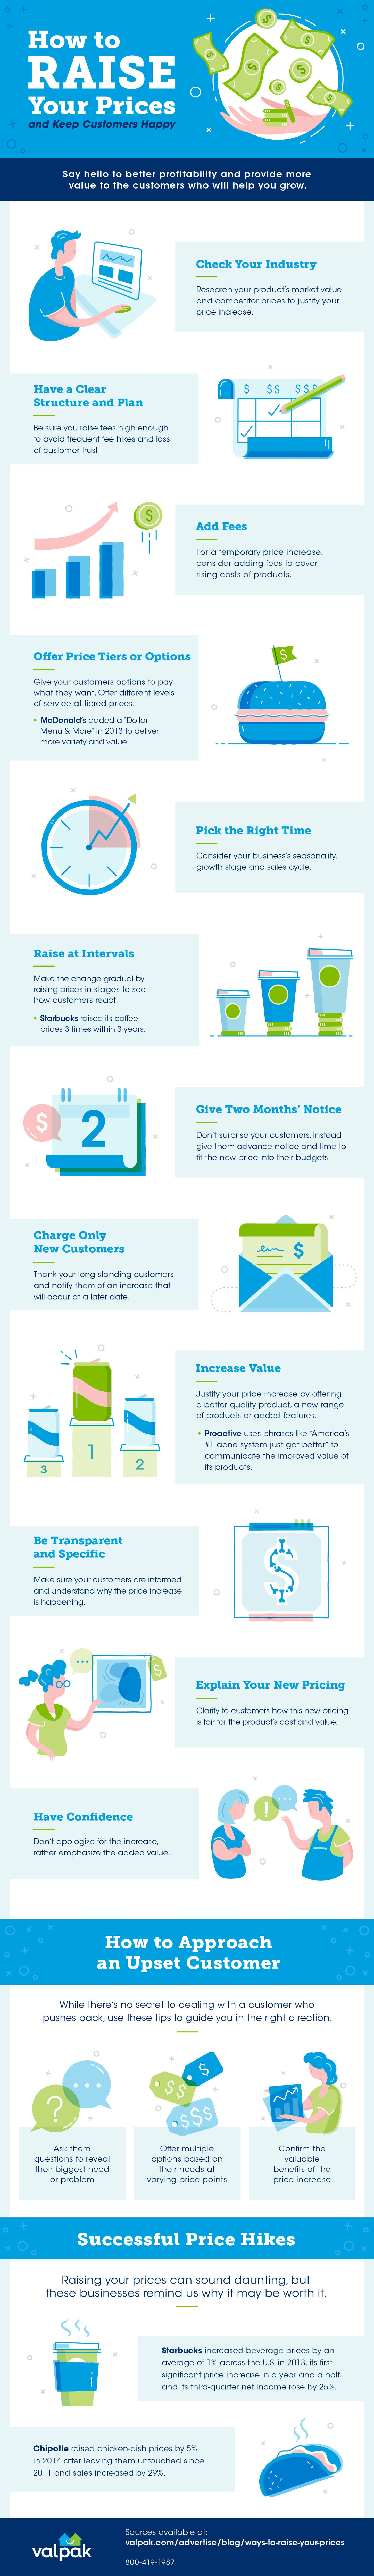 12 Ways To Raise Prices [Infographic]